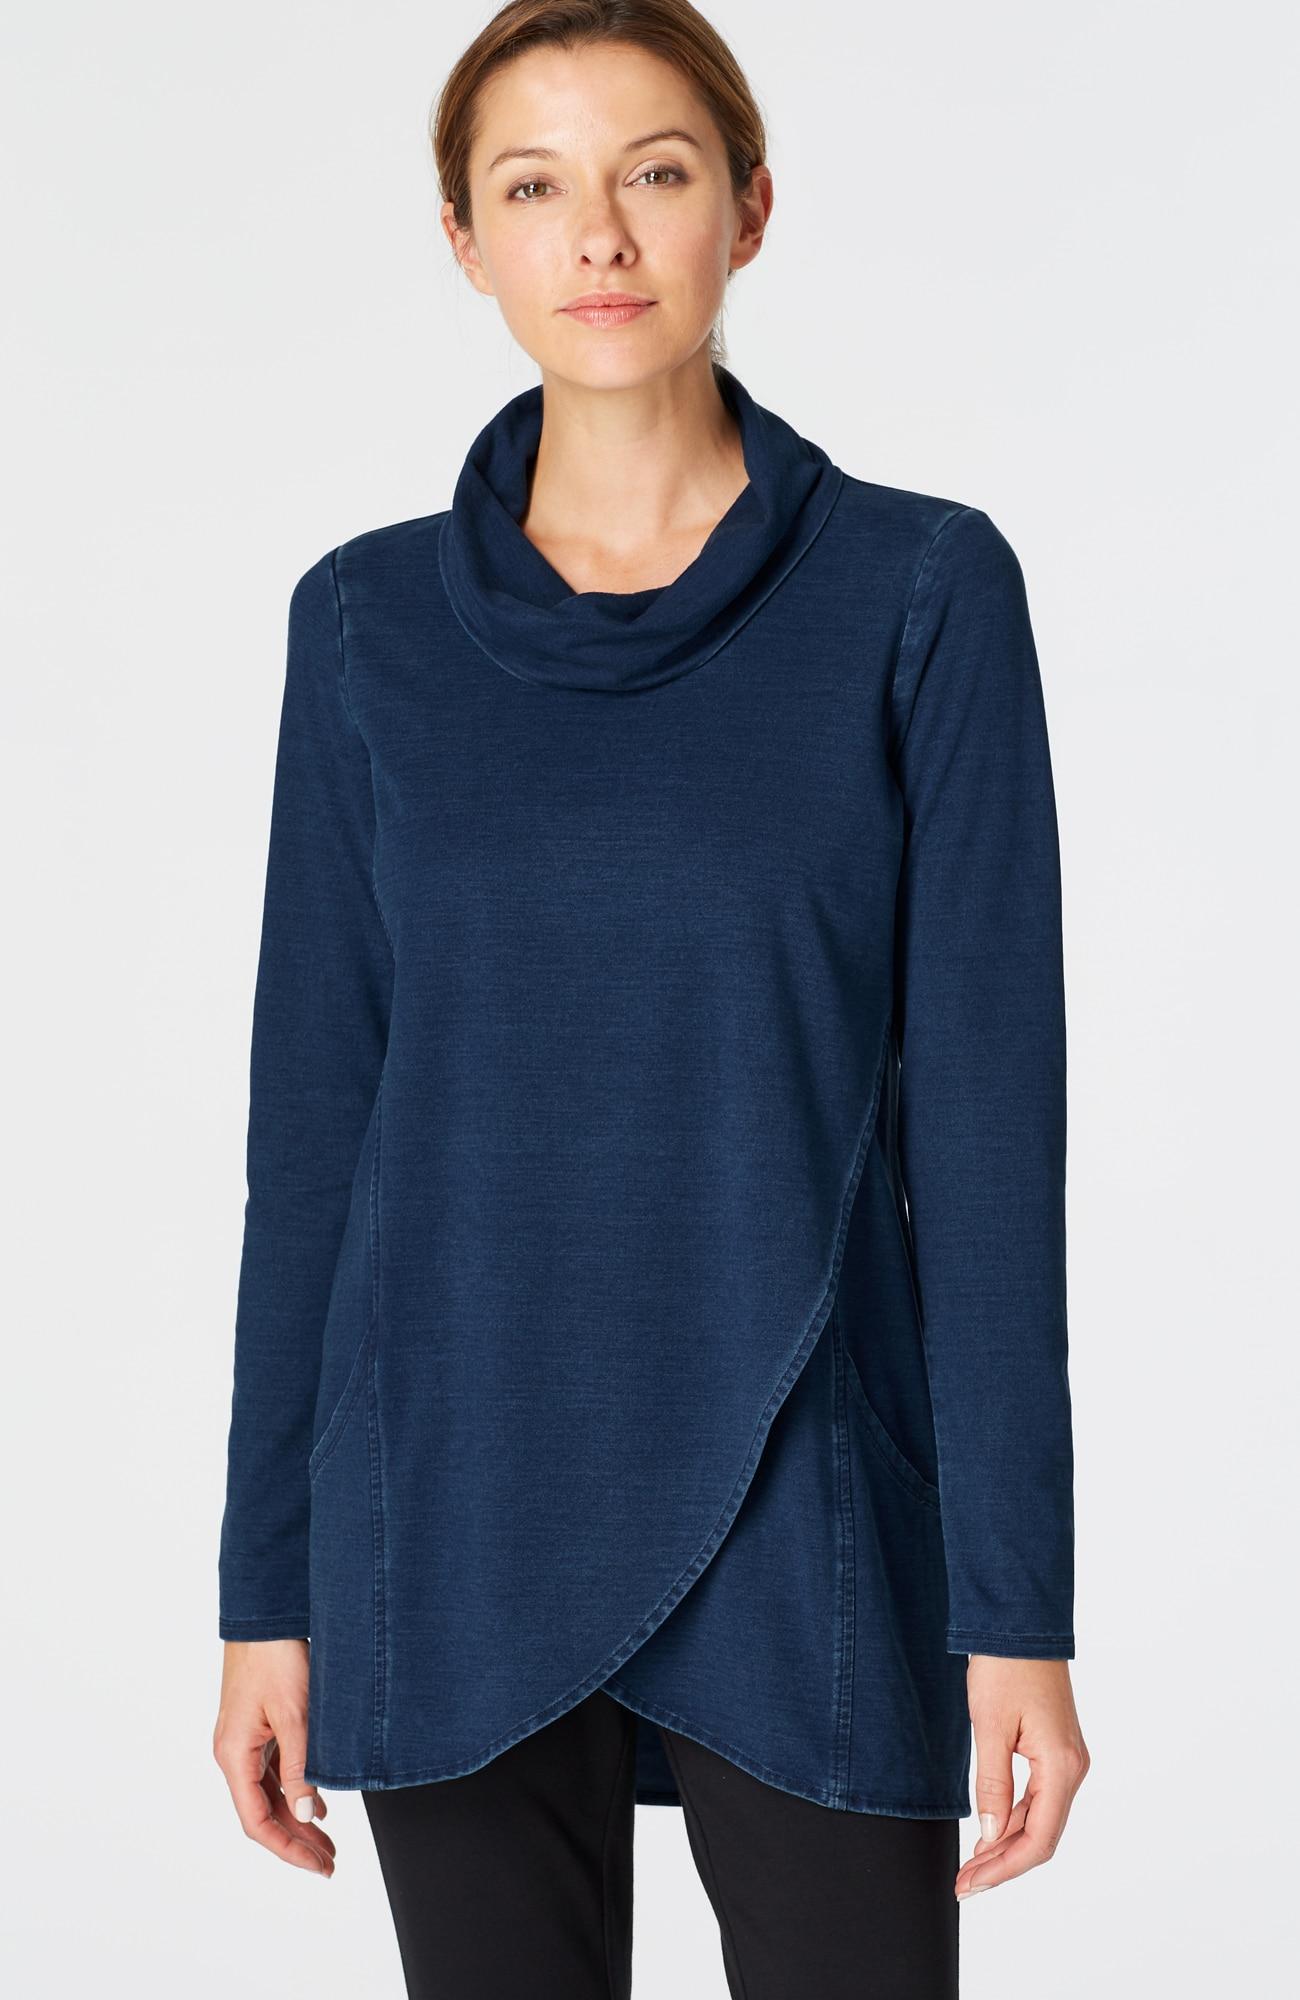 Pure Jill indigo knit wrap-style top